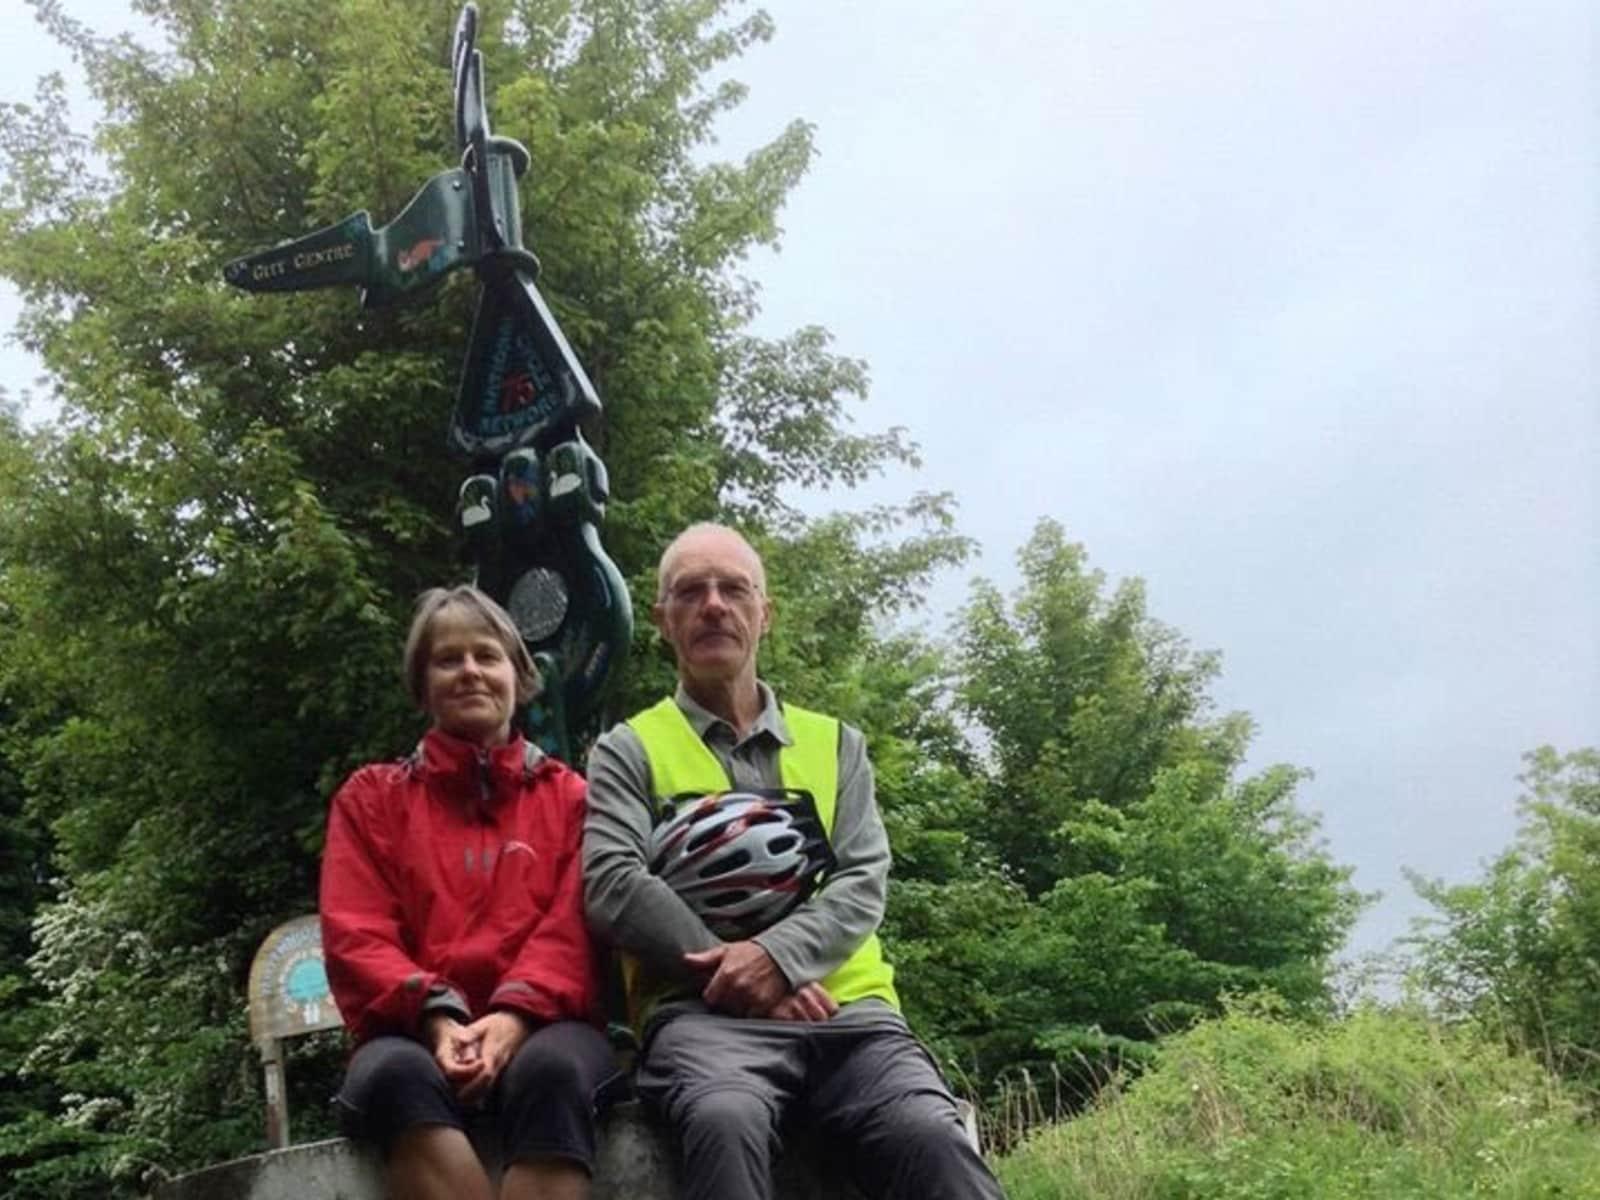 Frances & Stephen from Wellington, New Zealand